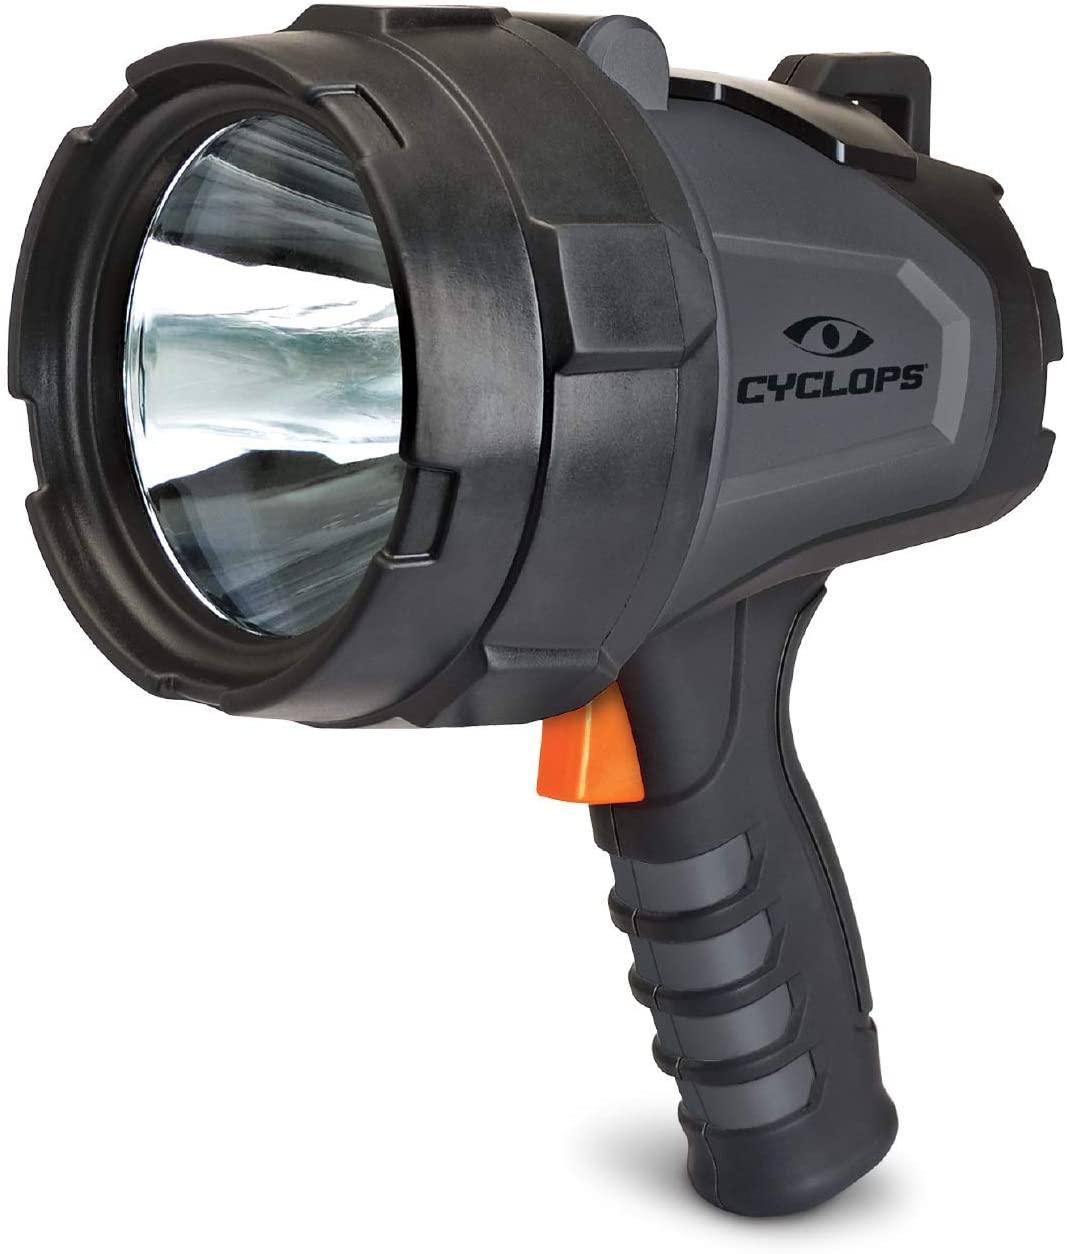 Cyclops 900 Lum 10 Watt Led Spotlight, Multi, One Size